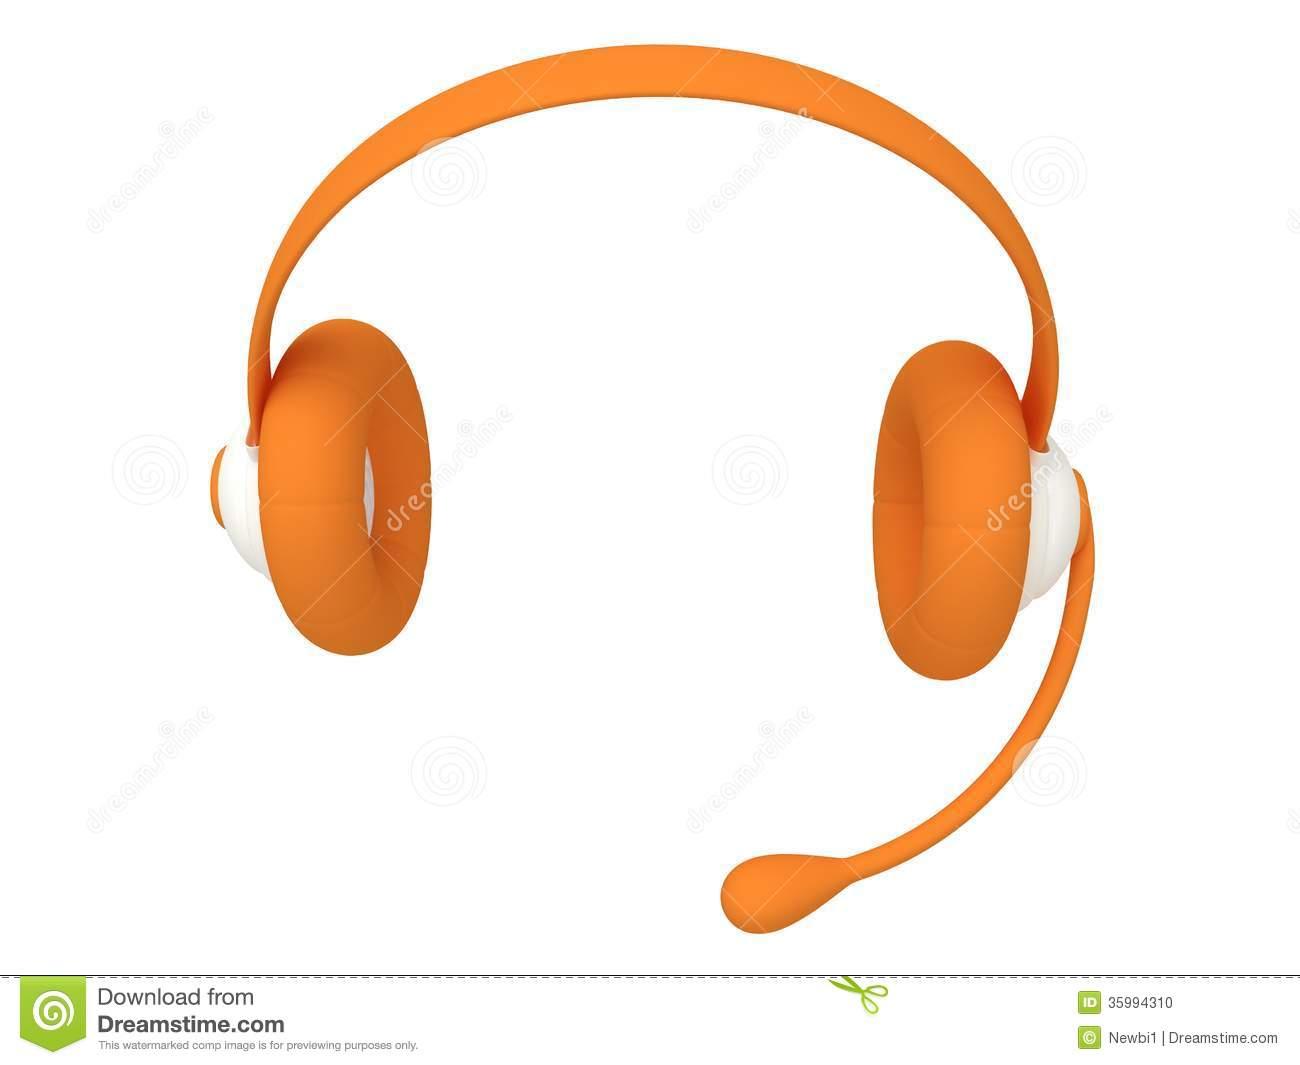 Headphone clipart orange Images Panda Free Clipart Headset